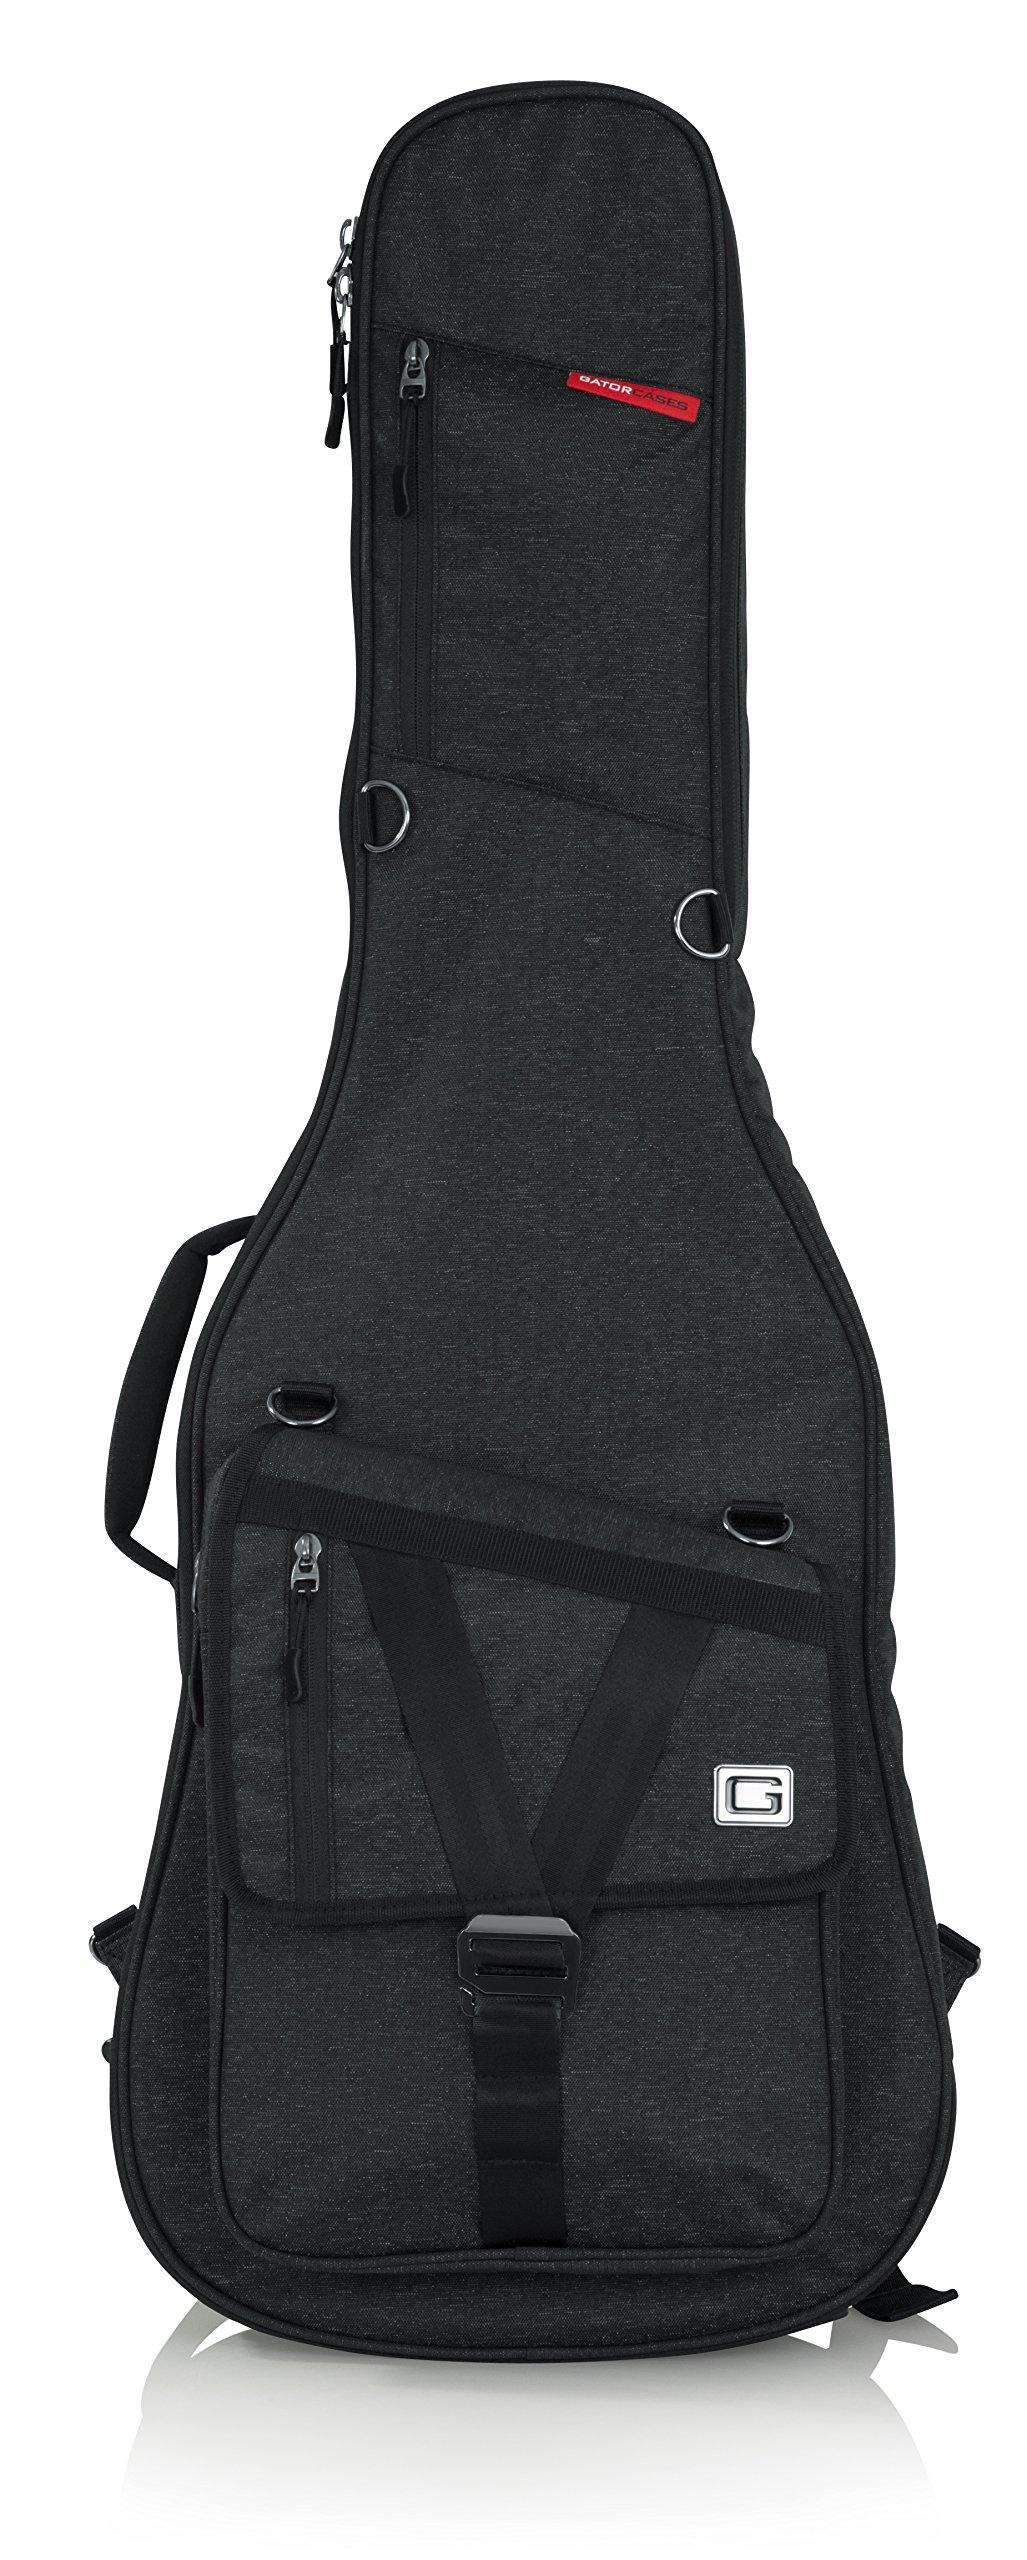 Gator Cases Transit Series Electric Guitar Gig Bag; Charcoal Black Exterior (GT-ELECTRIC-BLK)